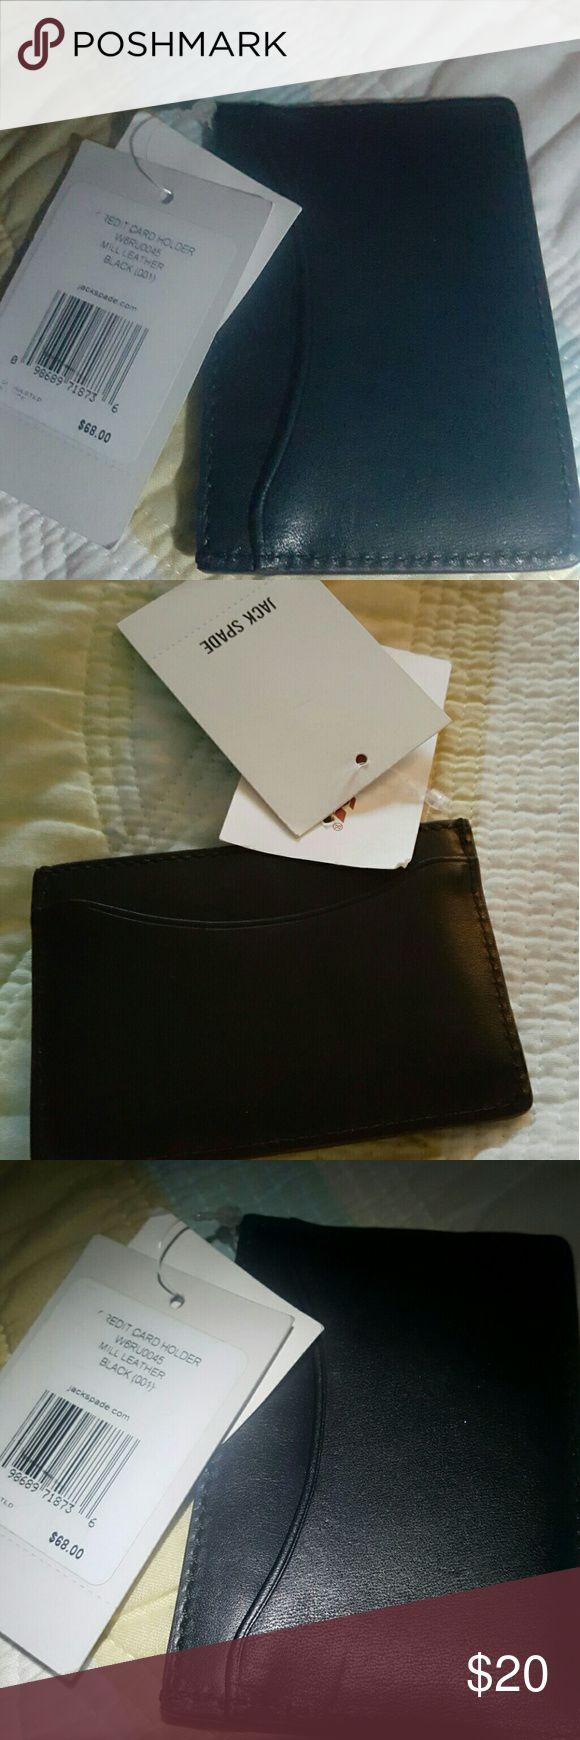 Jack Spade  (Kate Spade) black leather credit card Jack Spade  (Kate Spade) black leather credit card holder Jack Spade Accessories Key & Card Holders